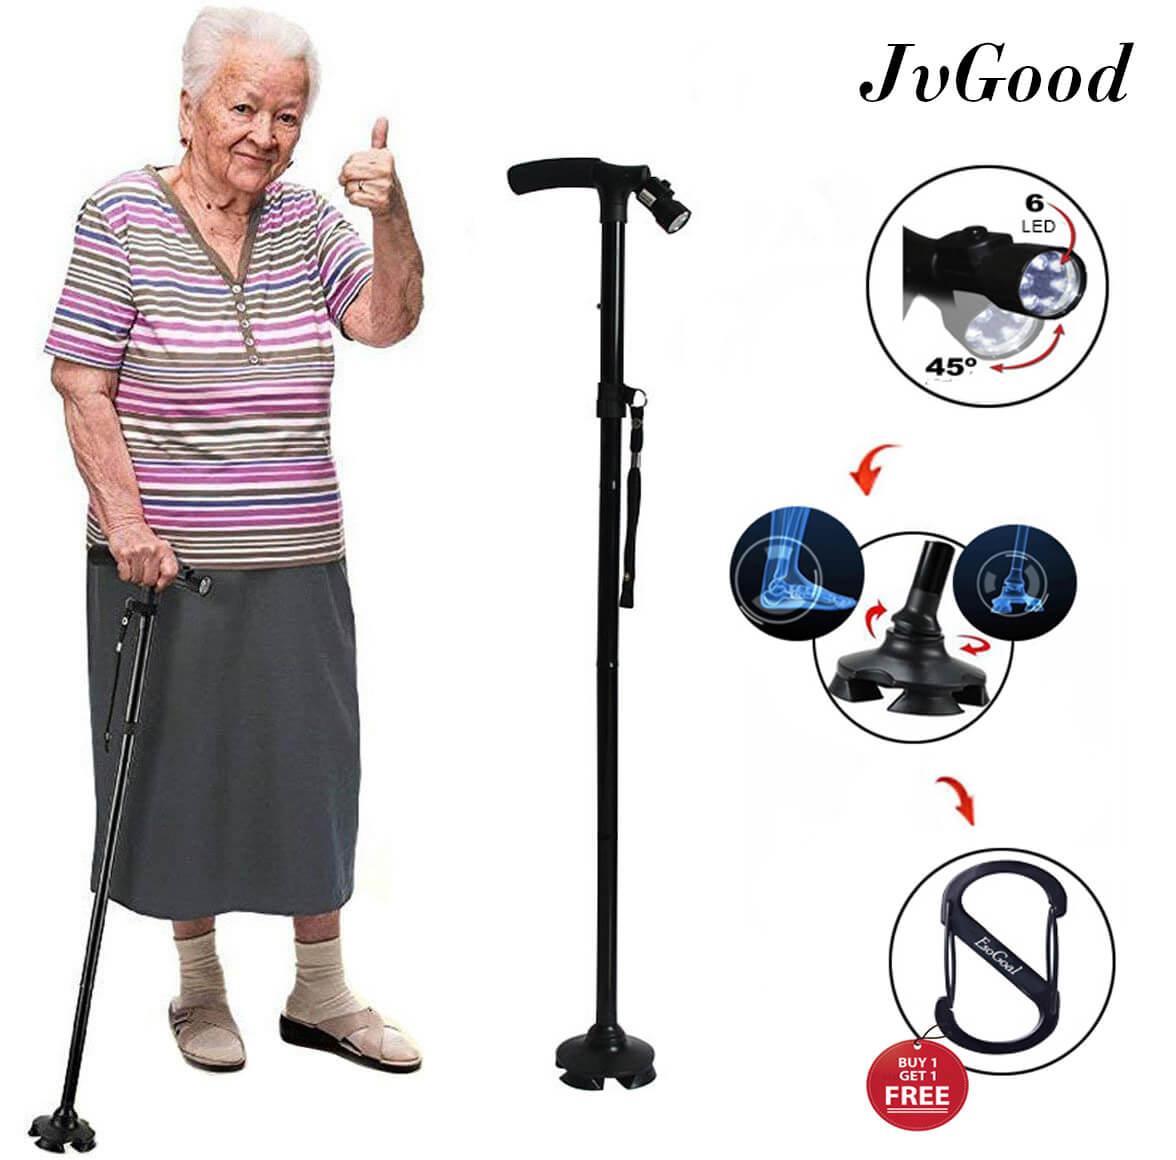 Rp 175.000 JvGood Walking Stick Folding Cane Crutch With LED Light 5 ...